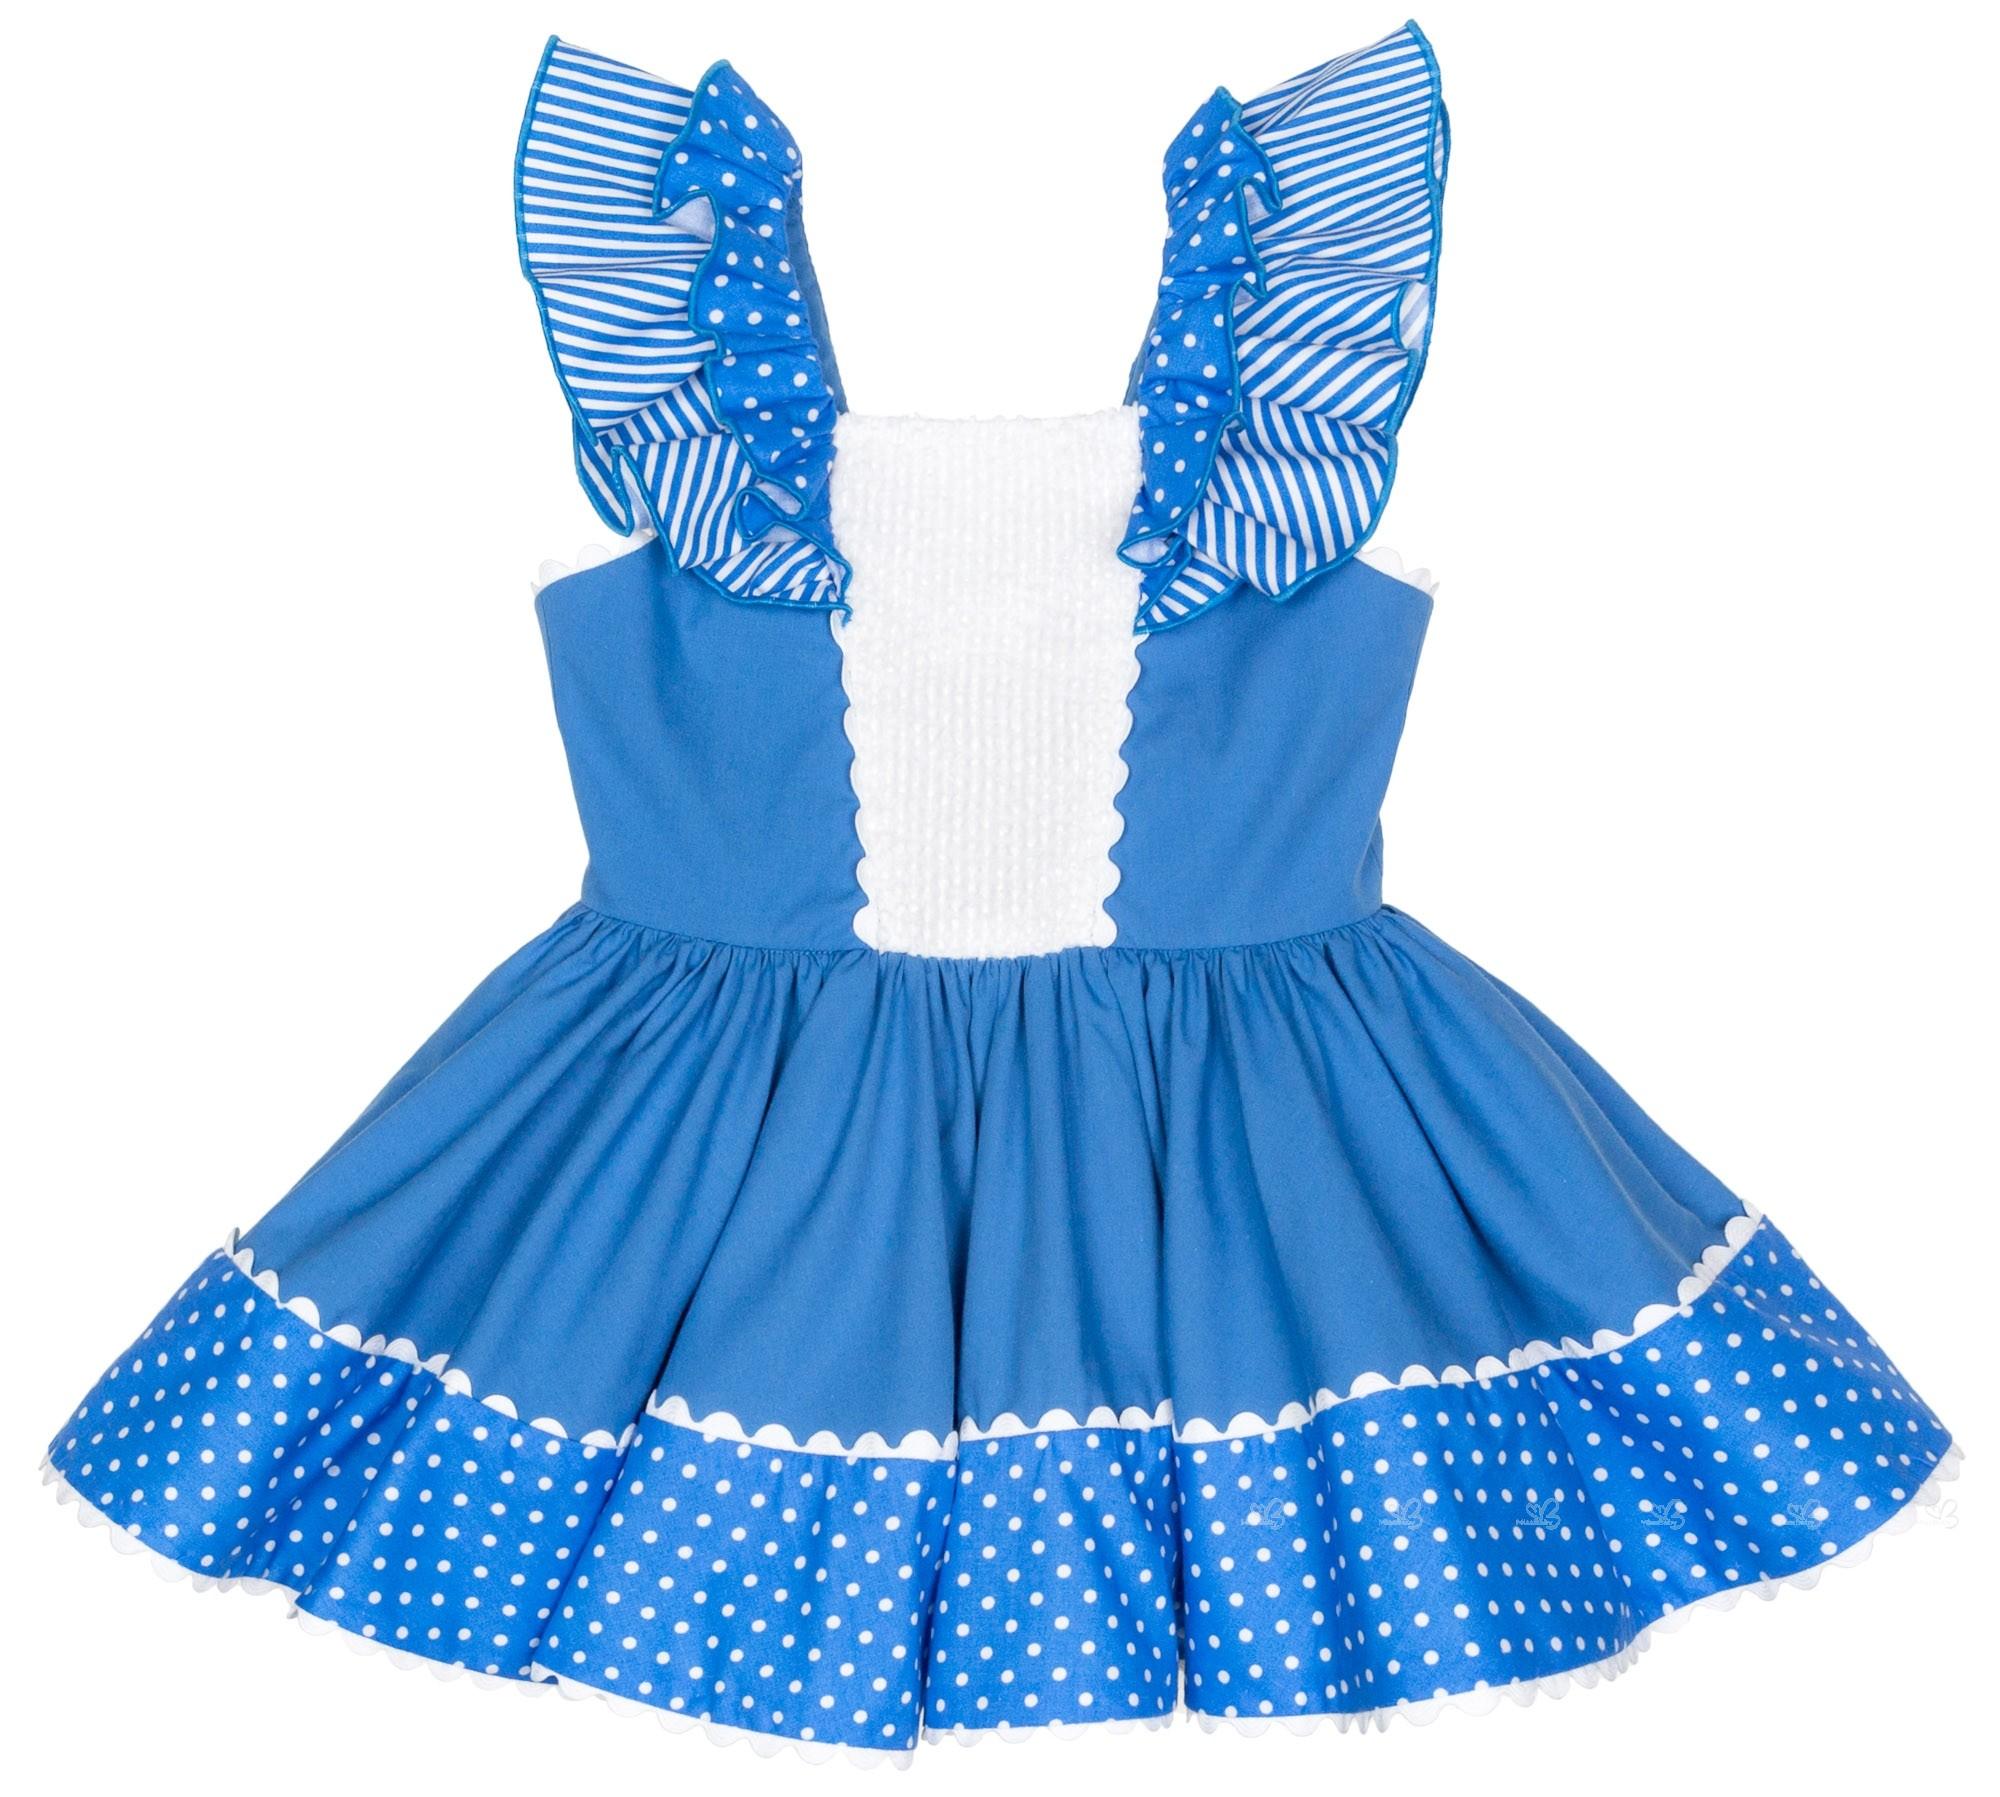 Vestido Niña Lazo Espalda Topitos Azul Blanco